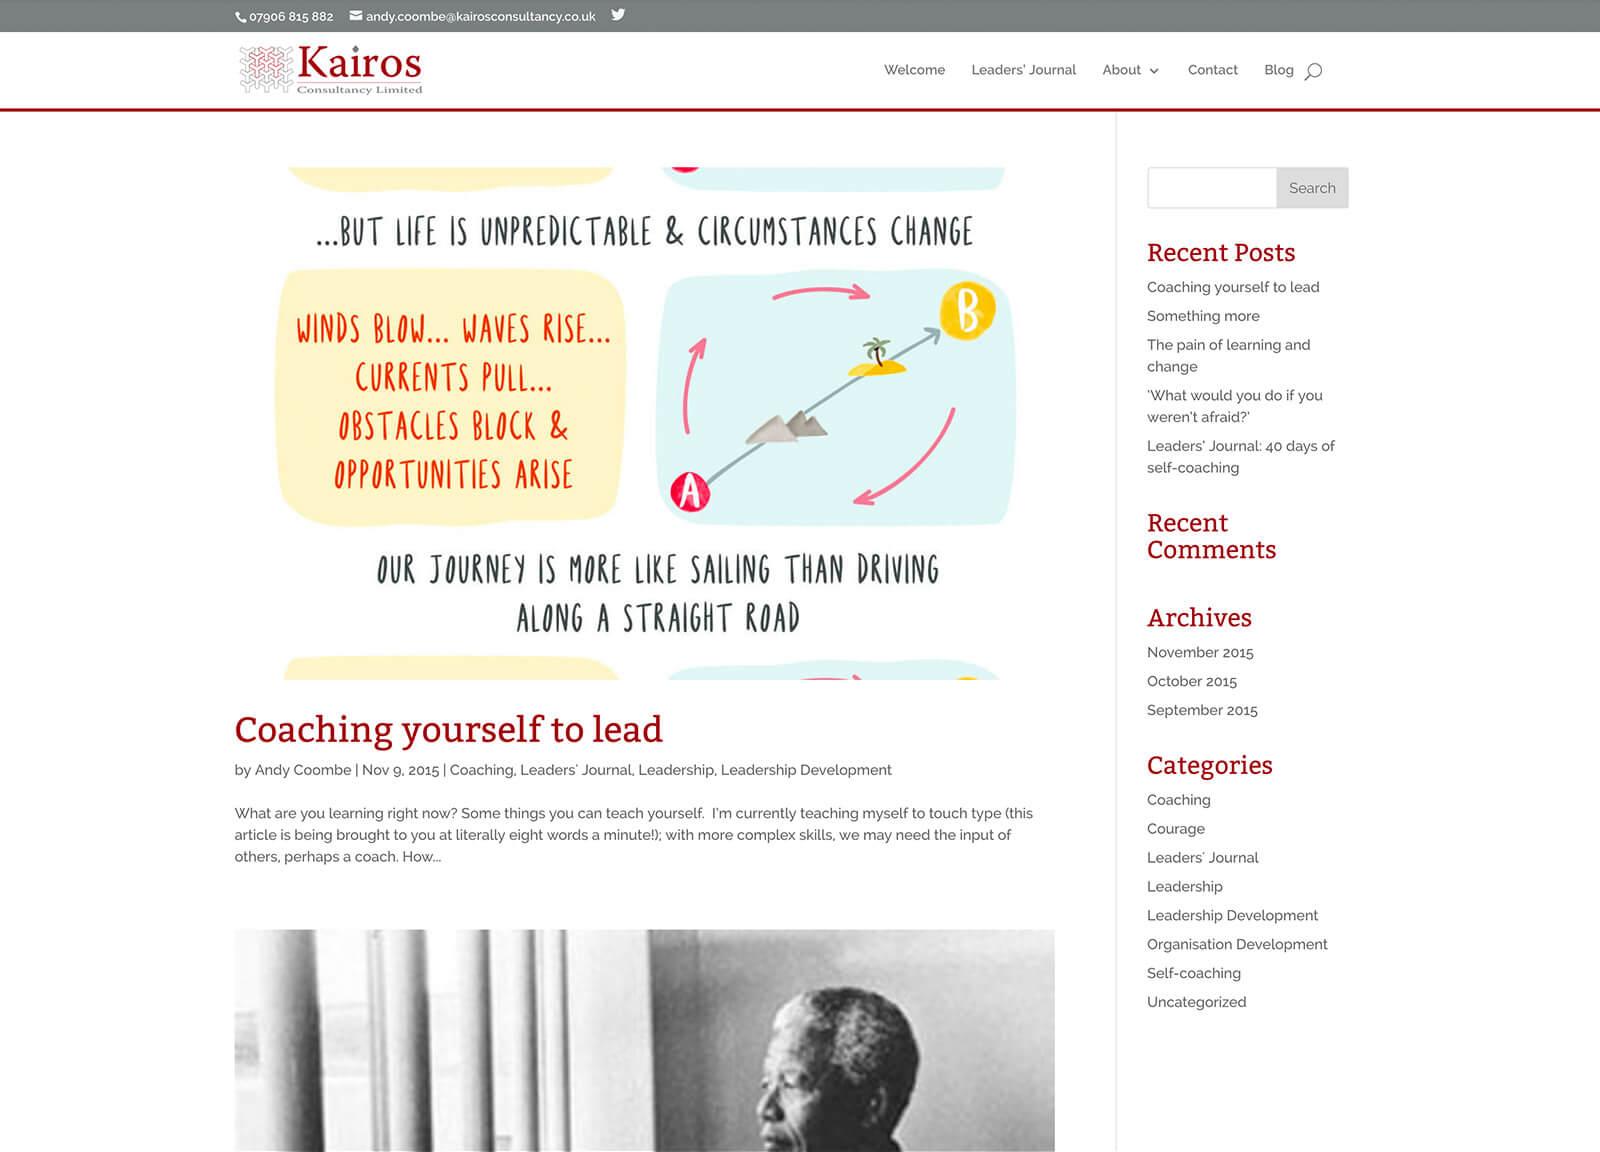 Consultancy company website design: Blog Page